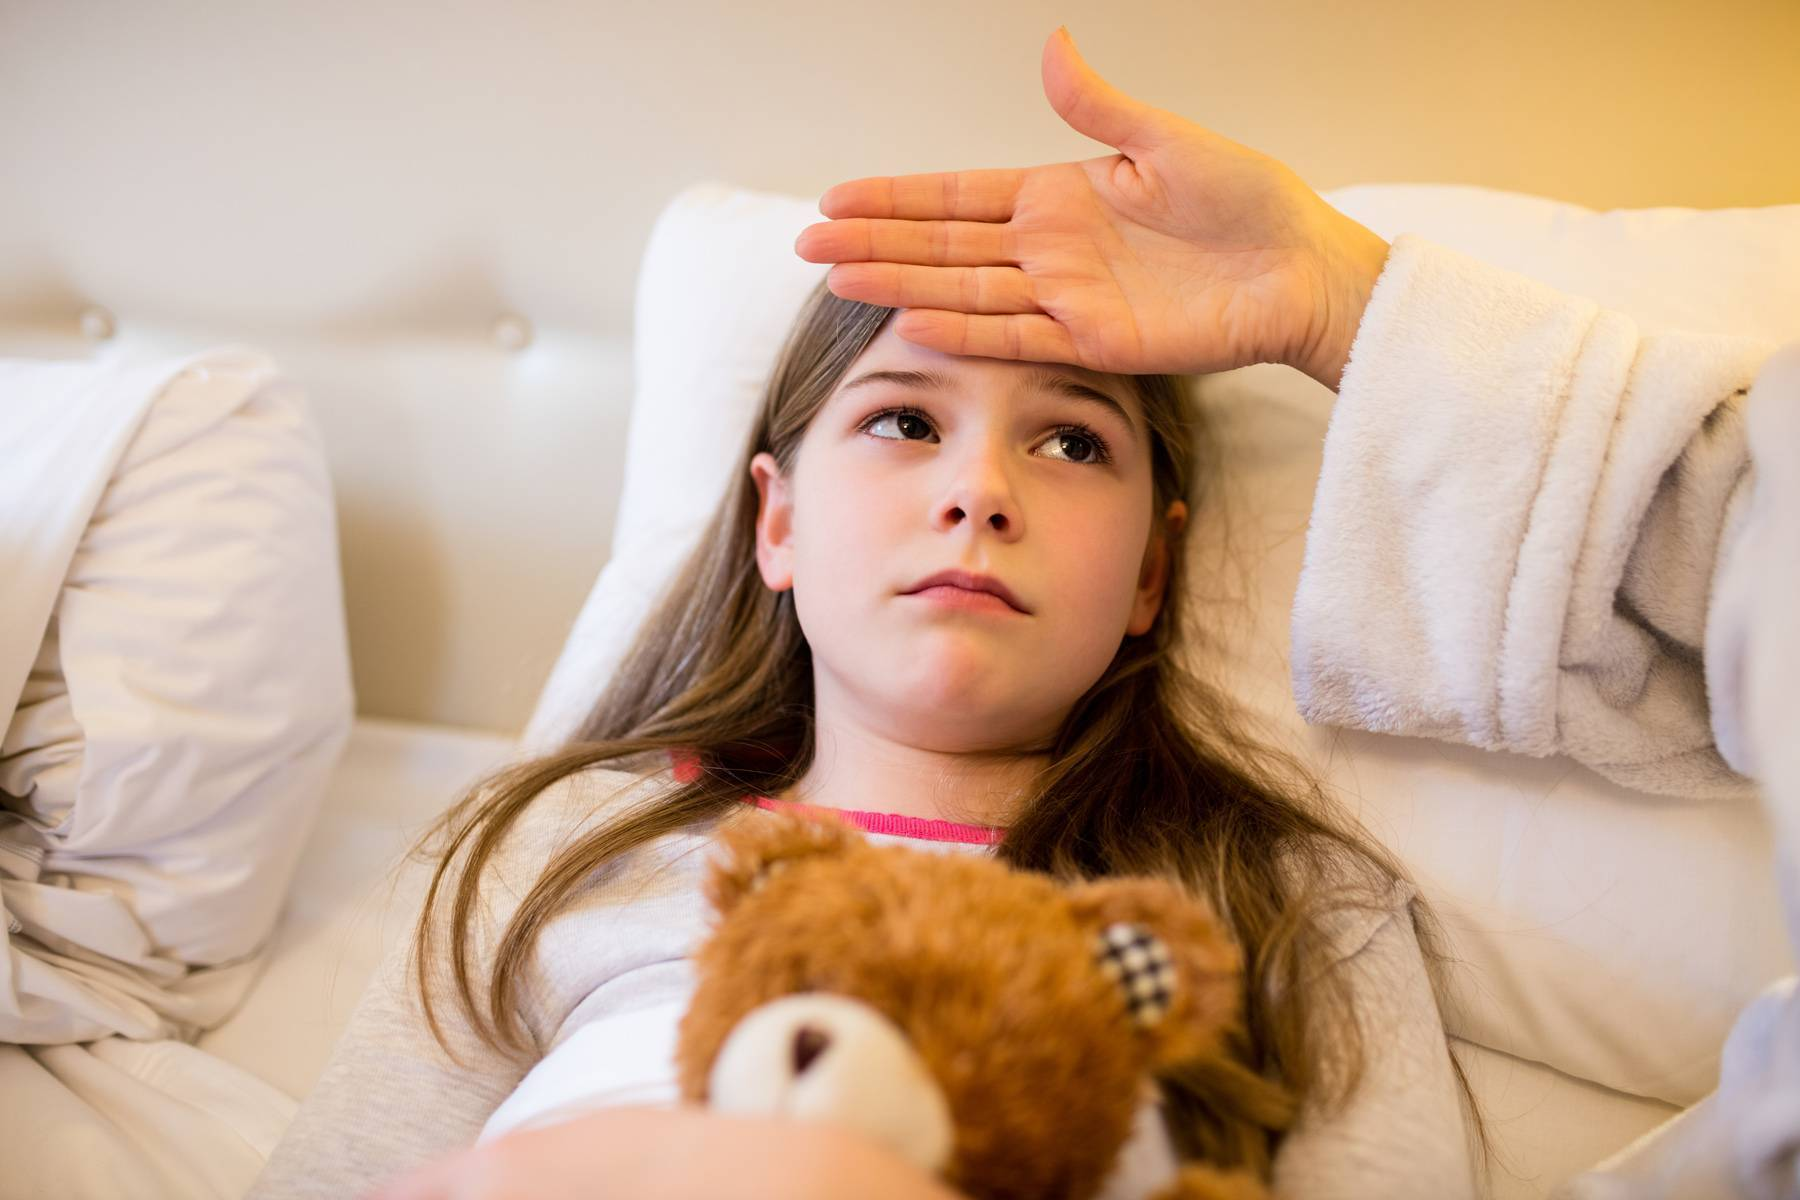 Температура у ребенка: какая нормальная и когда повышается. температура у месячного ребенка и ребенка до года